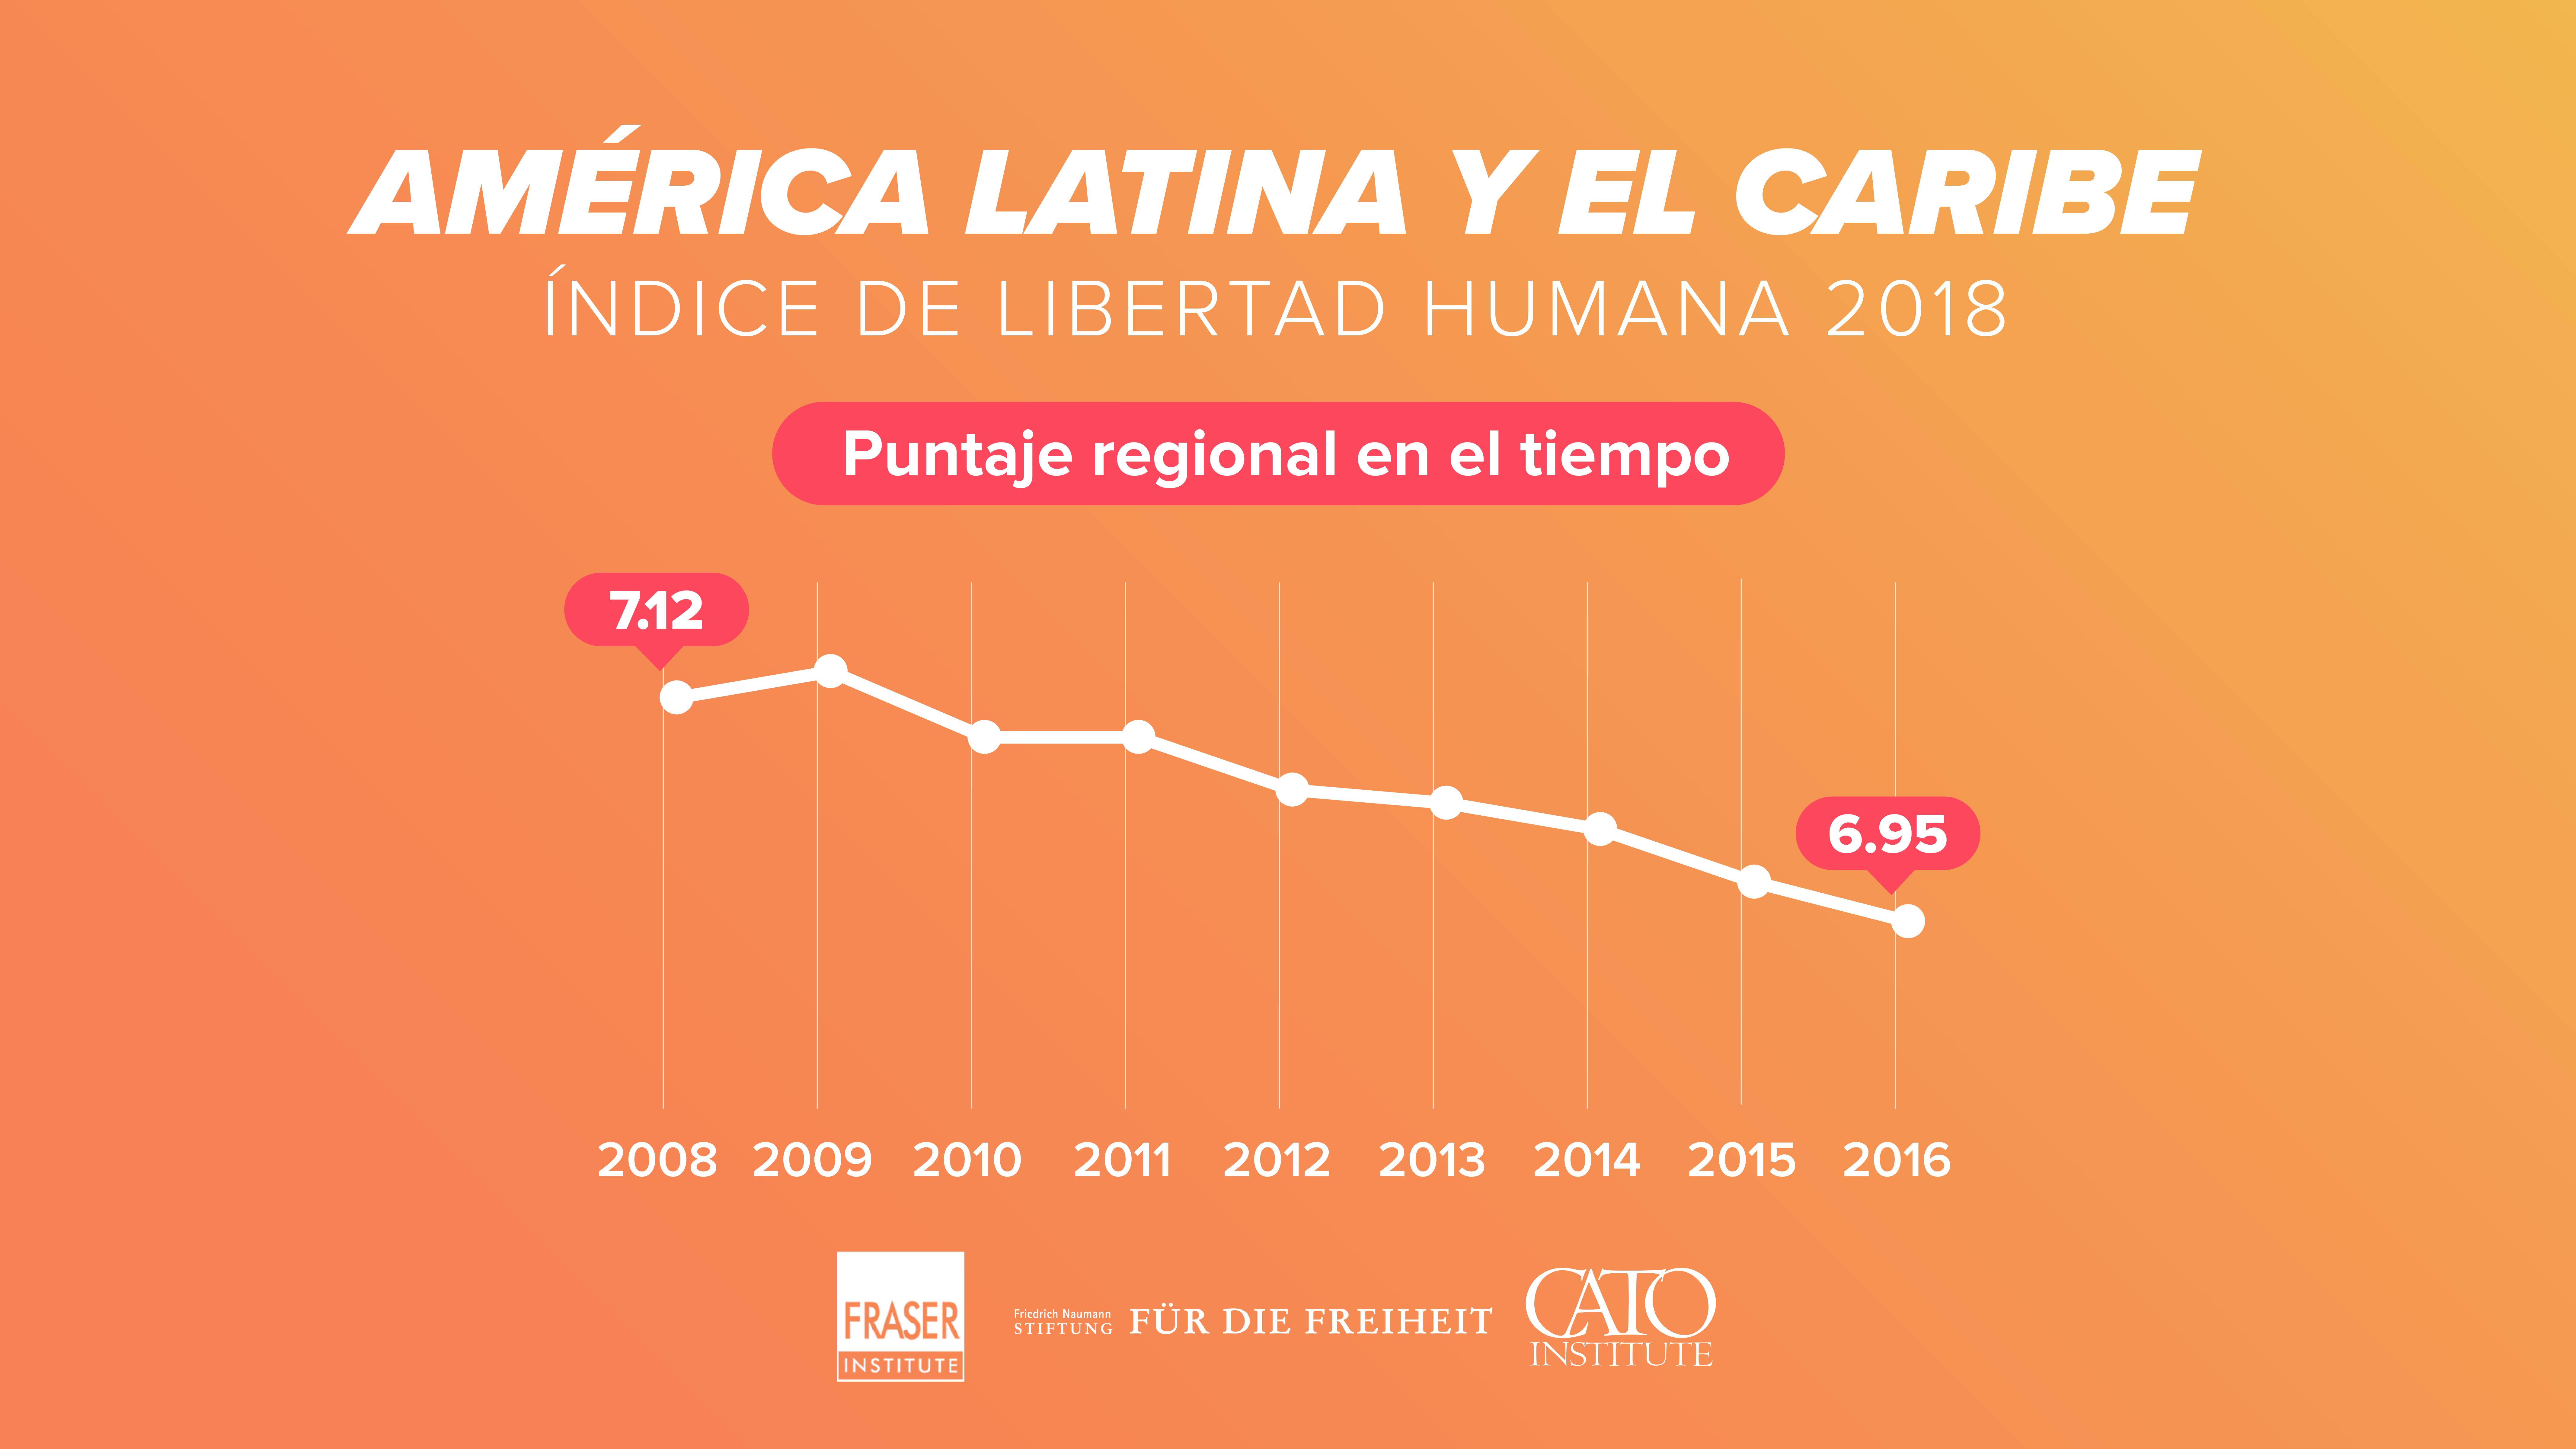 982cd6236 Nuevo informe global mide la libertad humana en América Latina ...